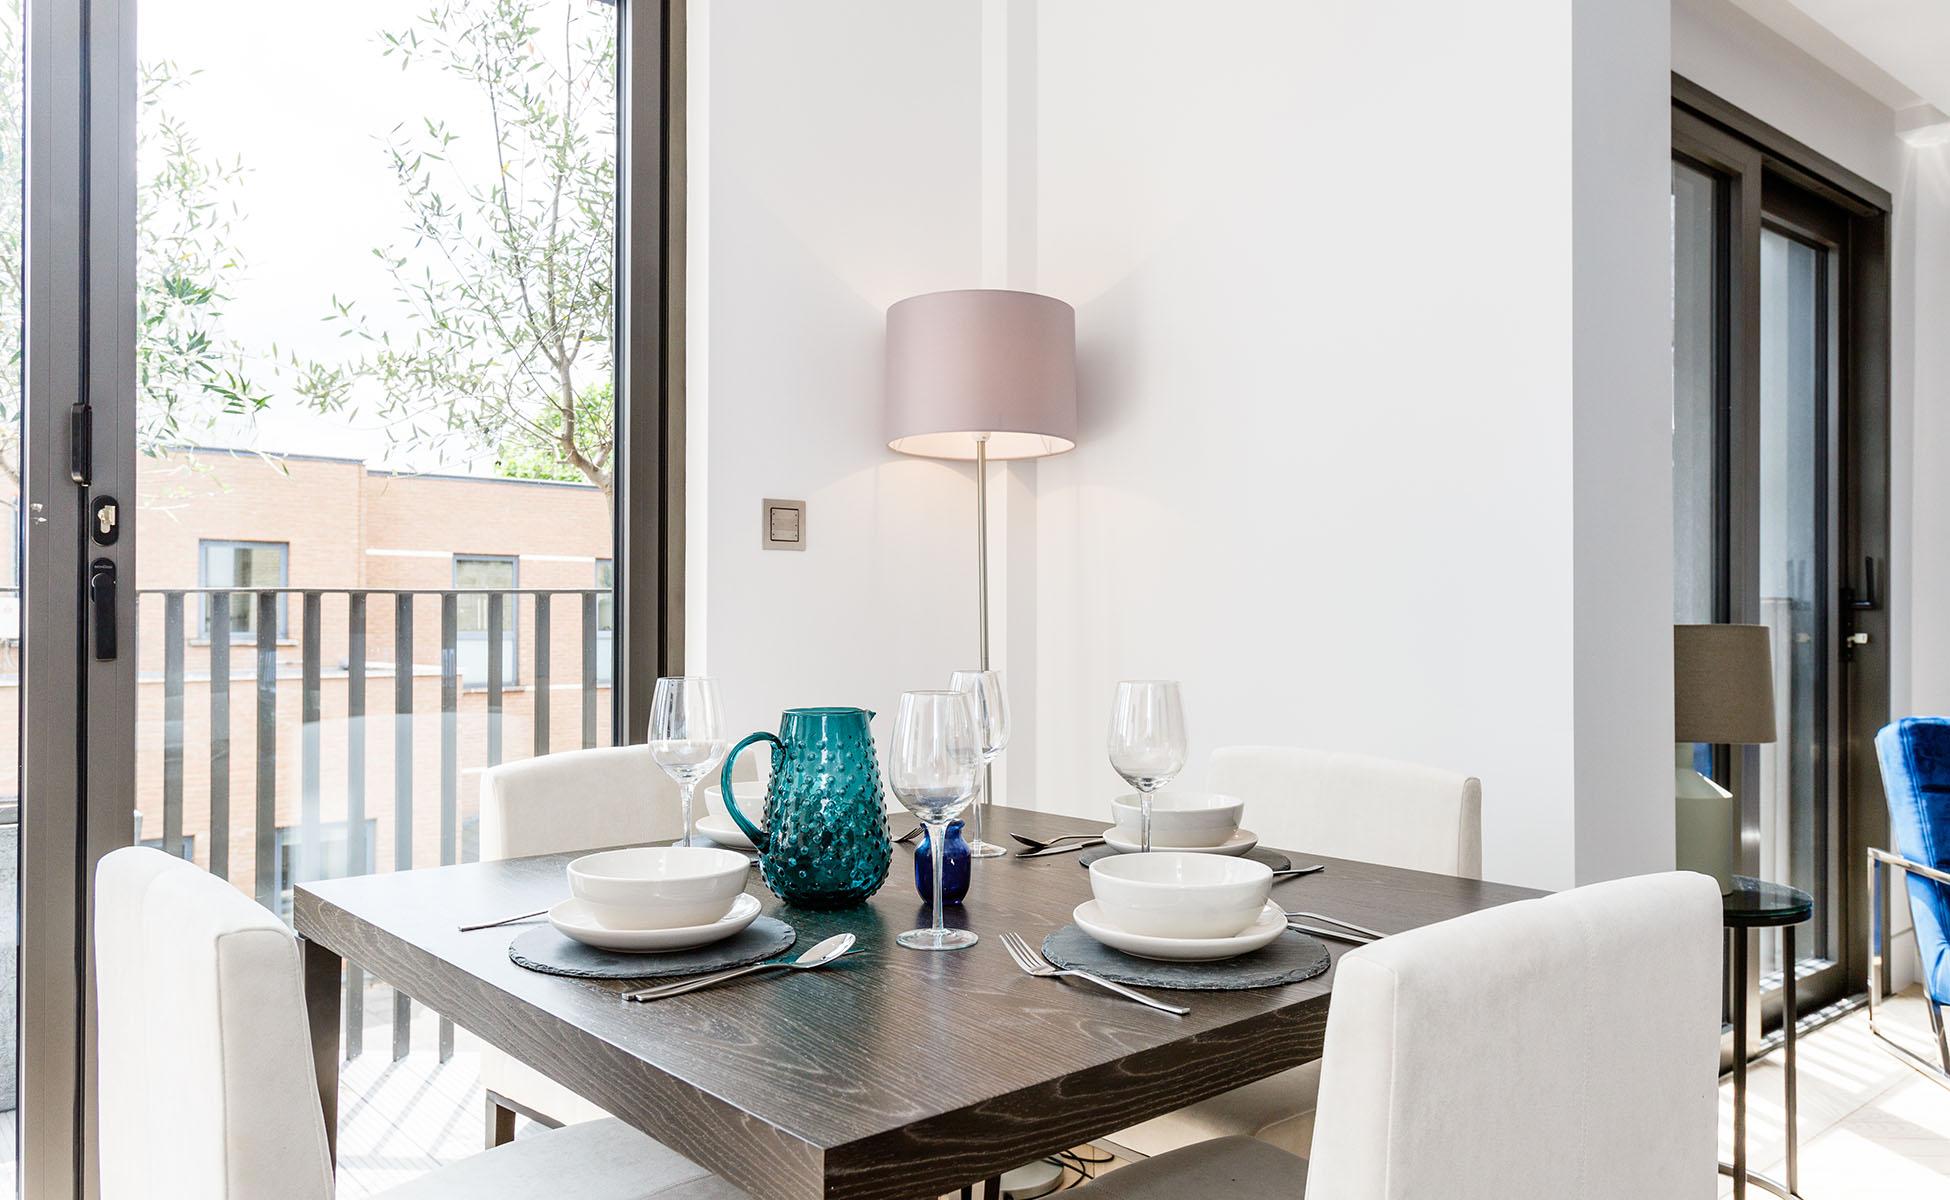 Lovelydays luxury service apartment rental - London - Fitzrovia - Newman Street IV - Lovelysuite - 2 bedrooms - 2 bathrooms - Dining living room - rent luxury apartment london - eeab988cd9f5 - Lovelydays